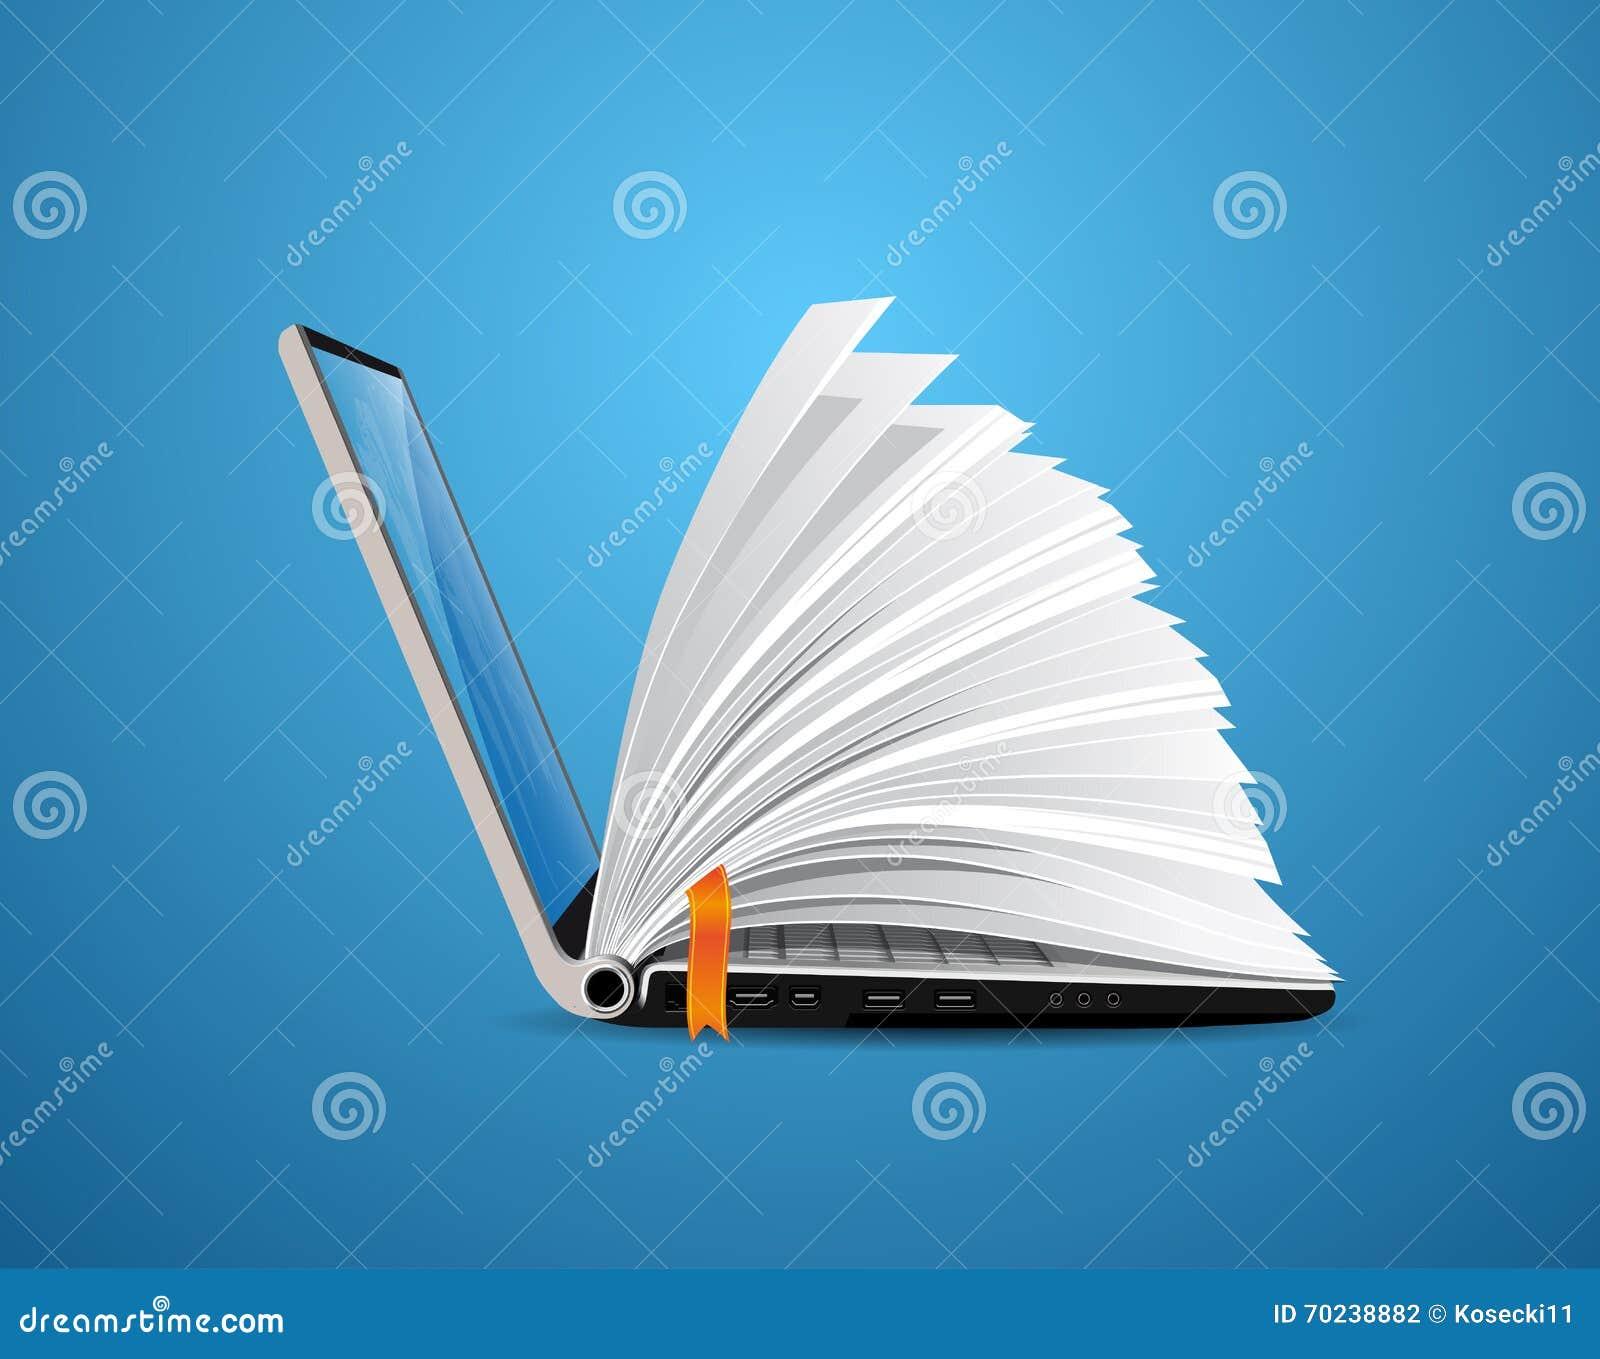 IT Mededeling - e-leert kennisbank, eBook